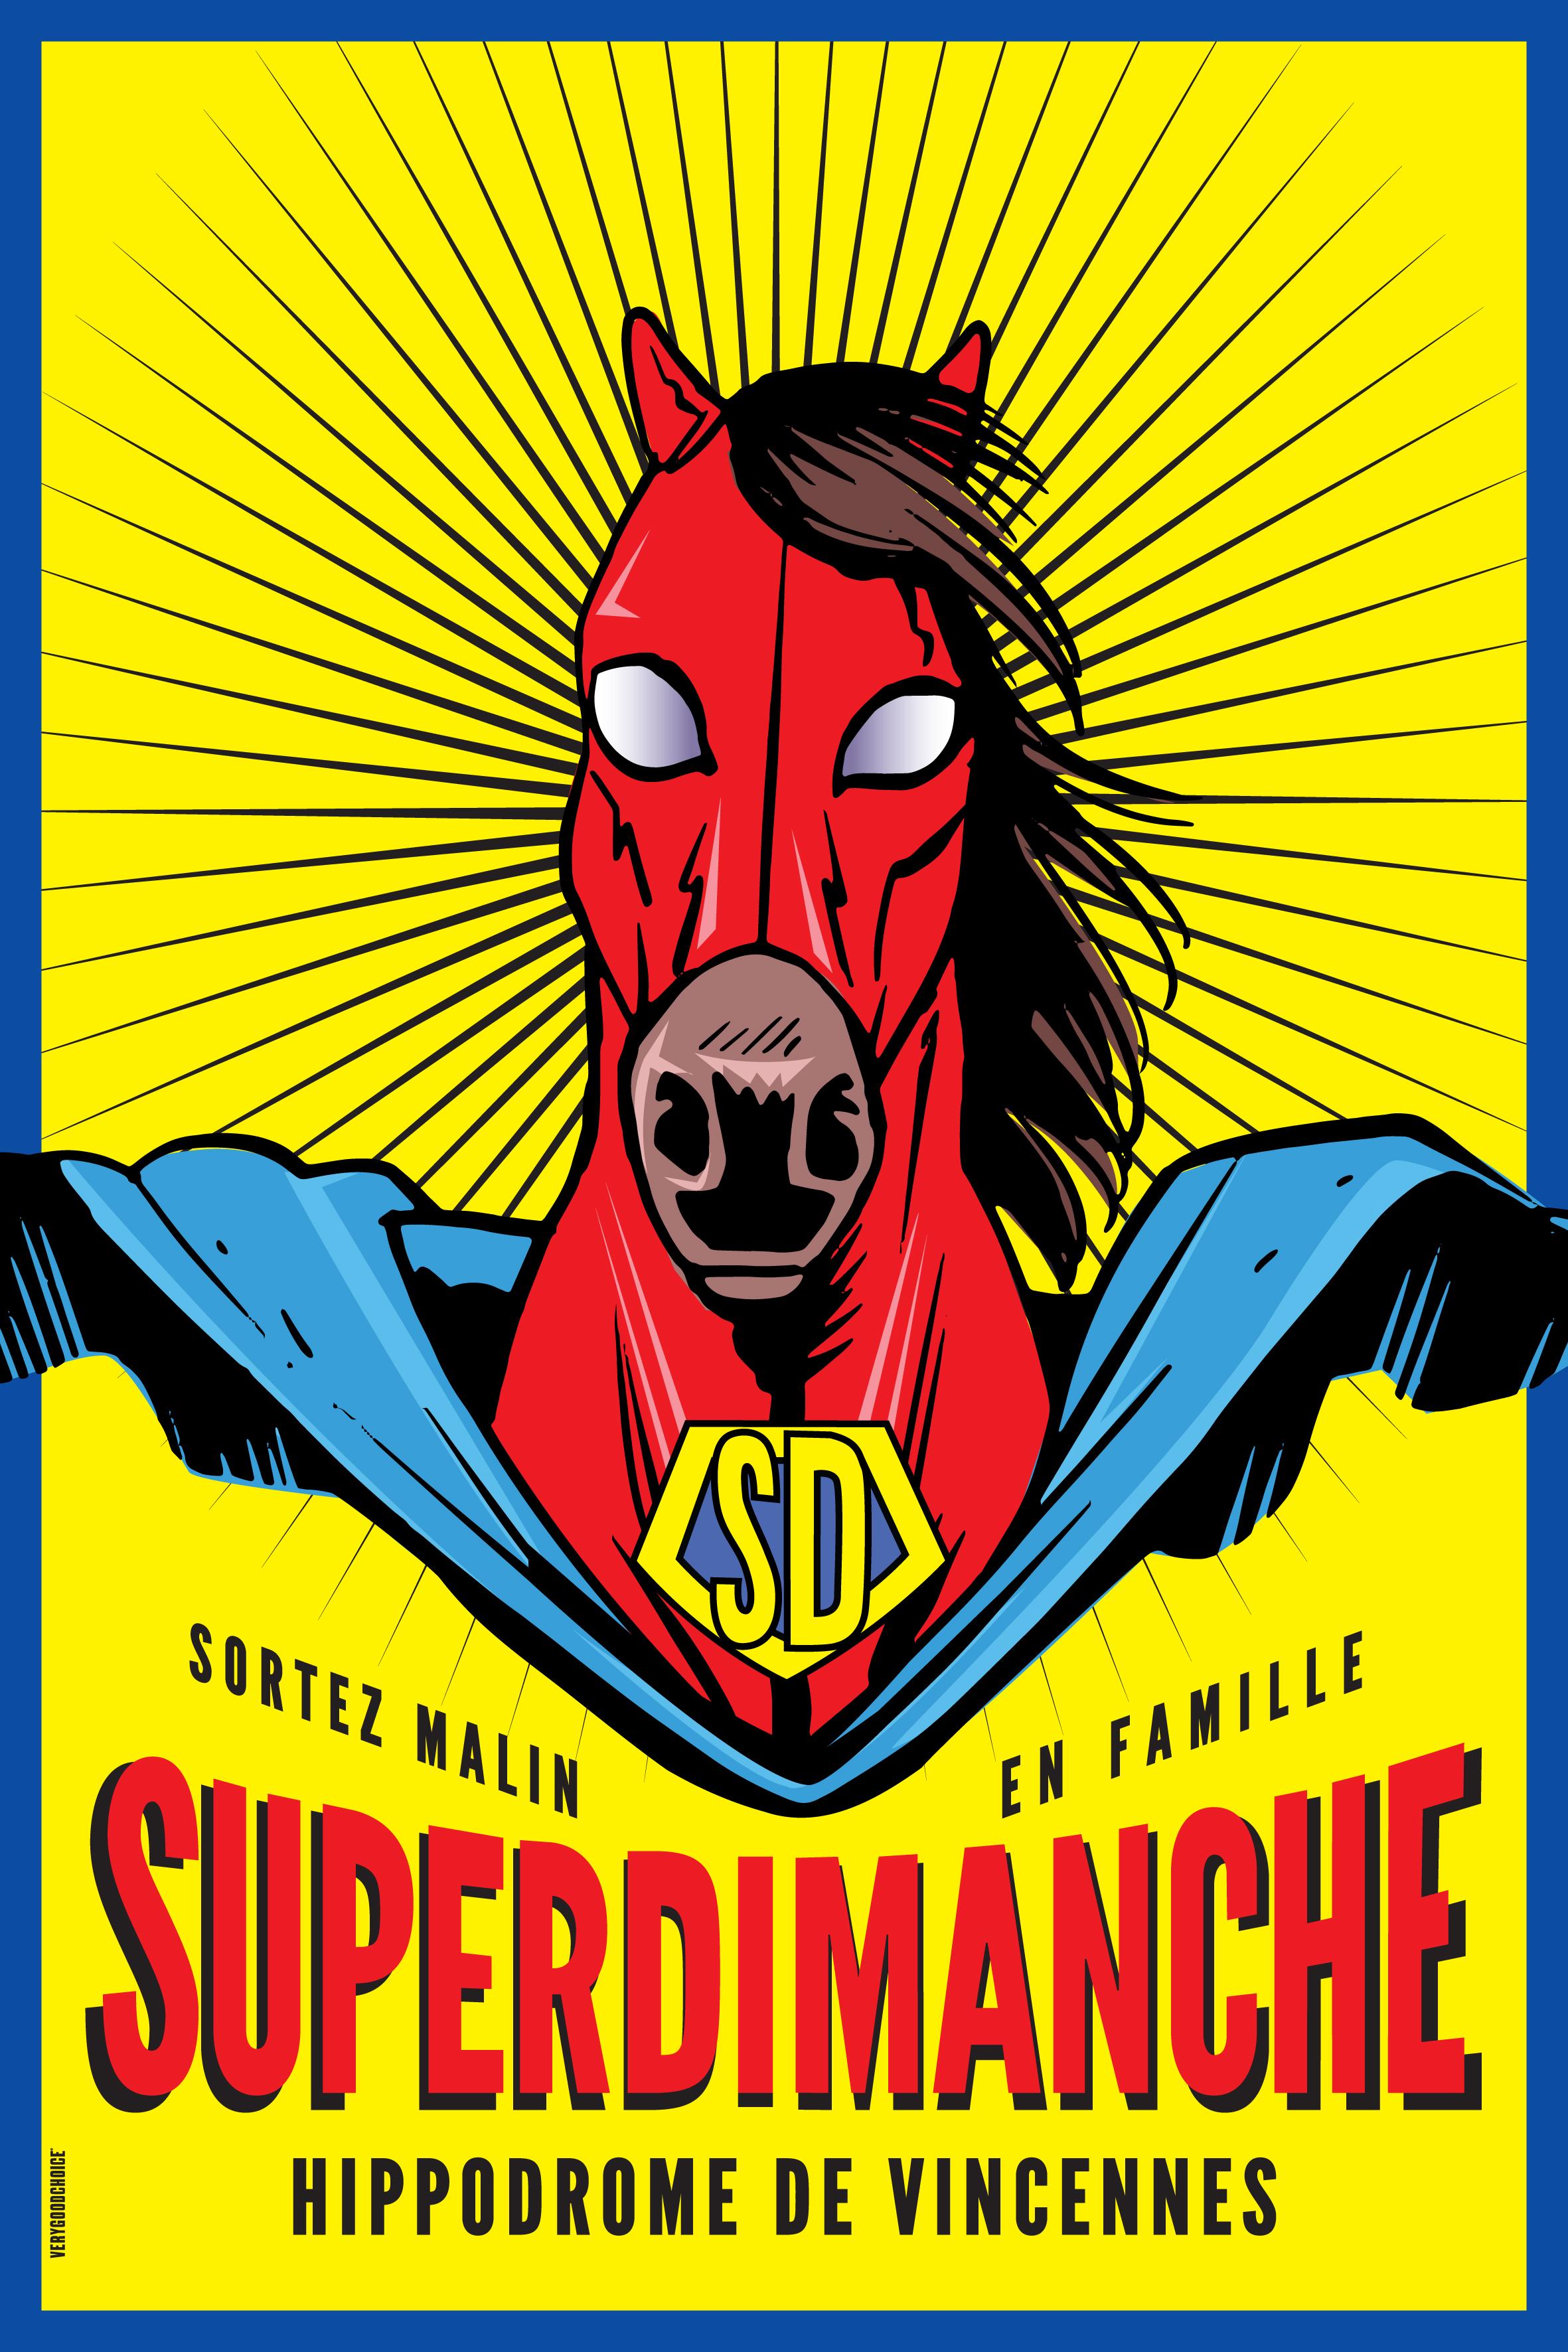 affiche-A4-superdimanche#PETER#4.indd